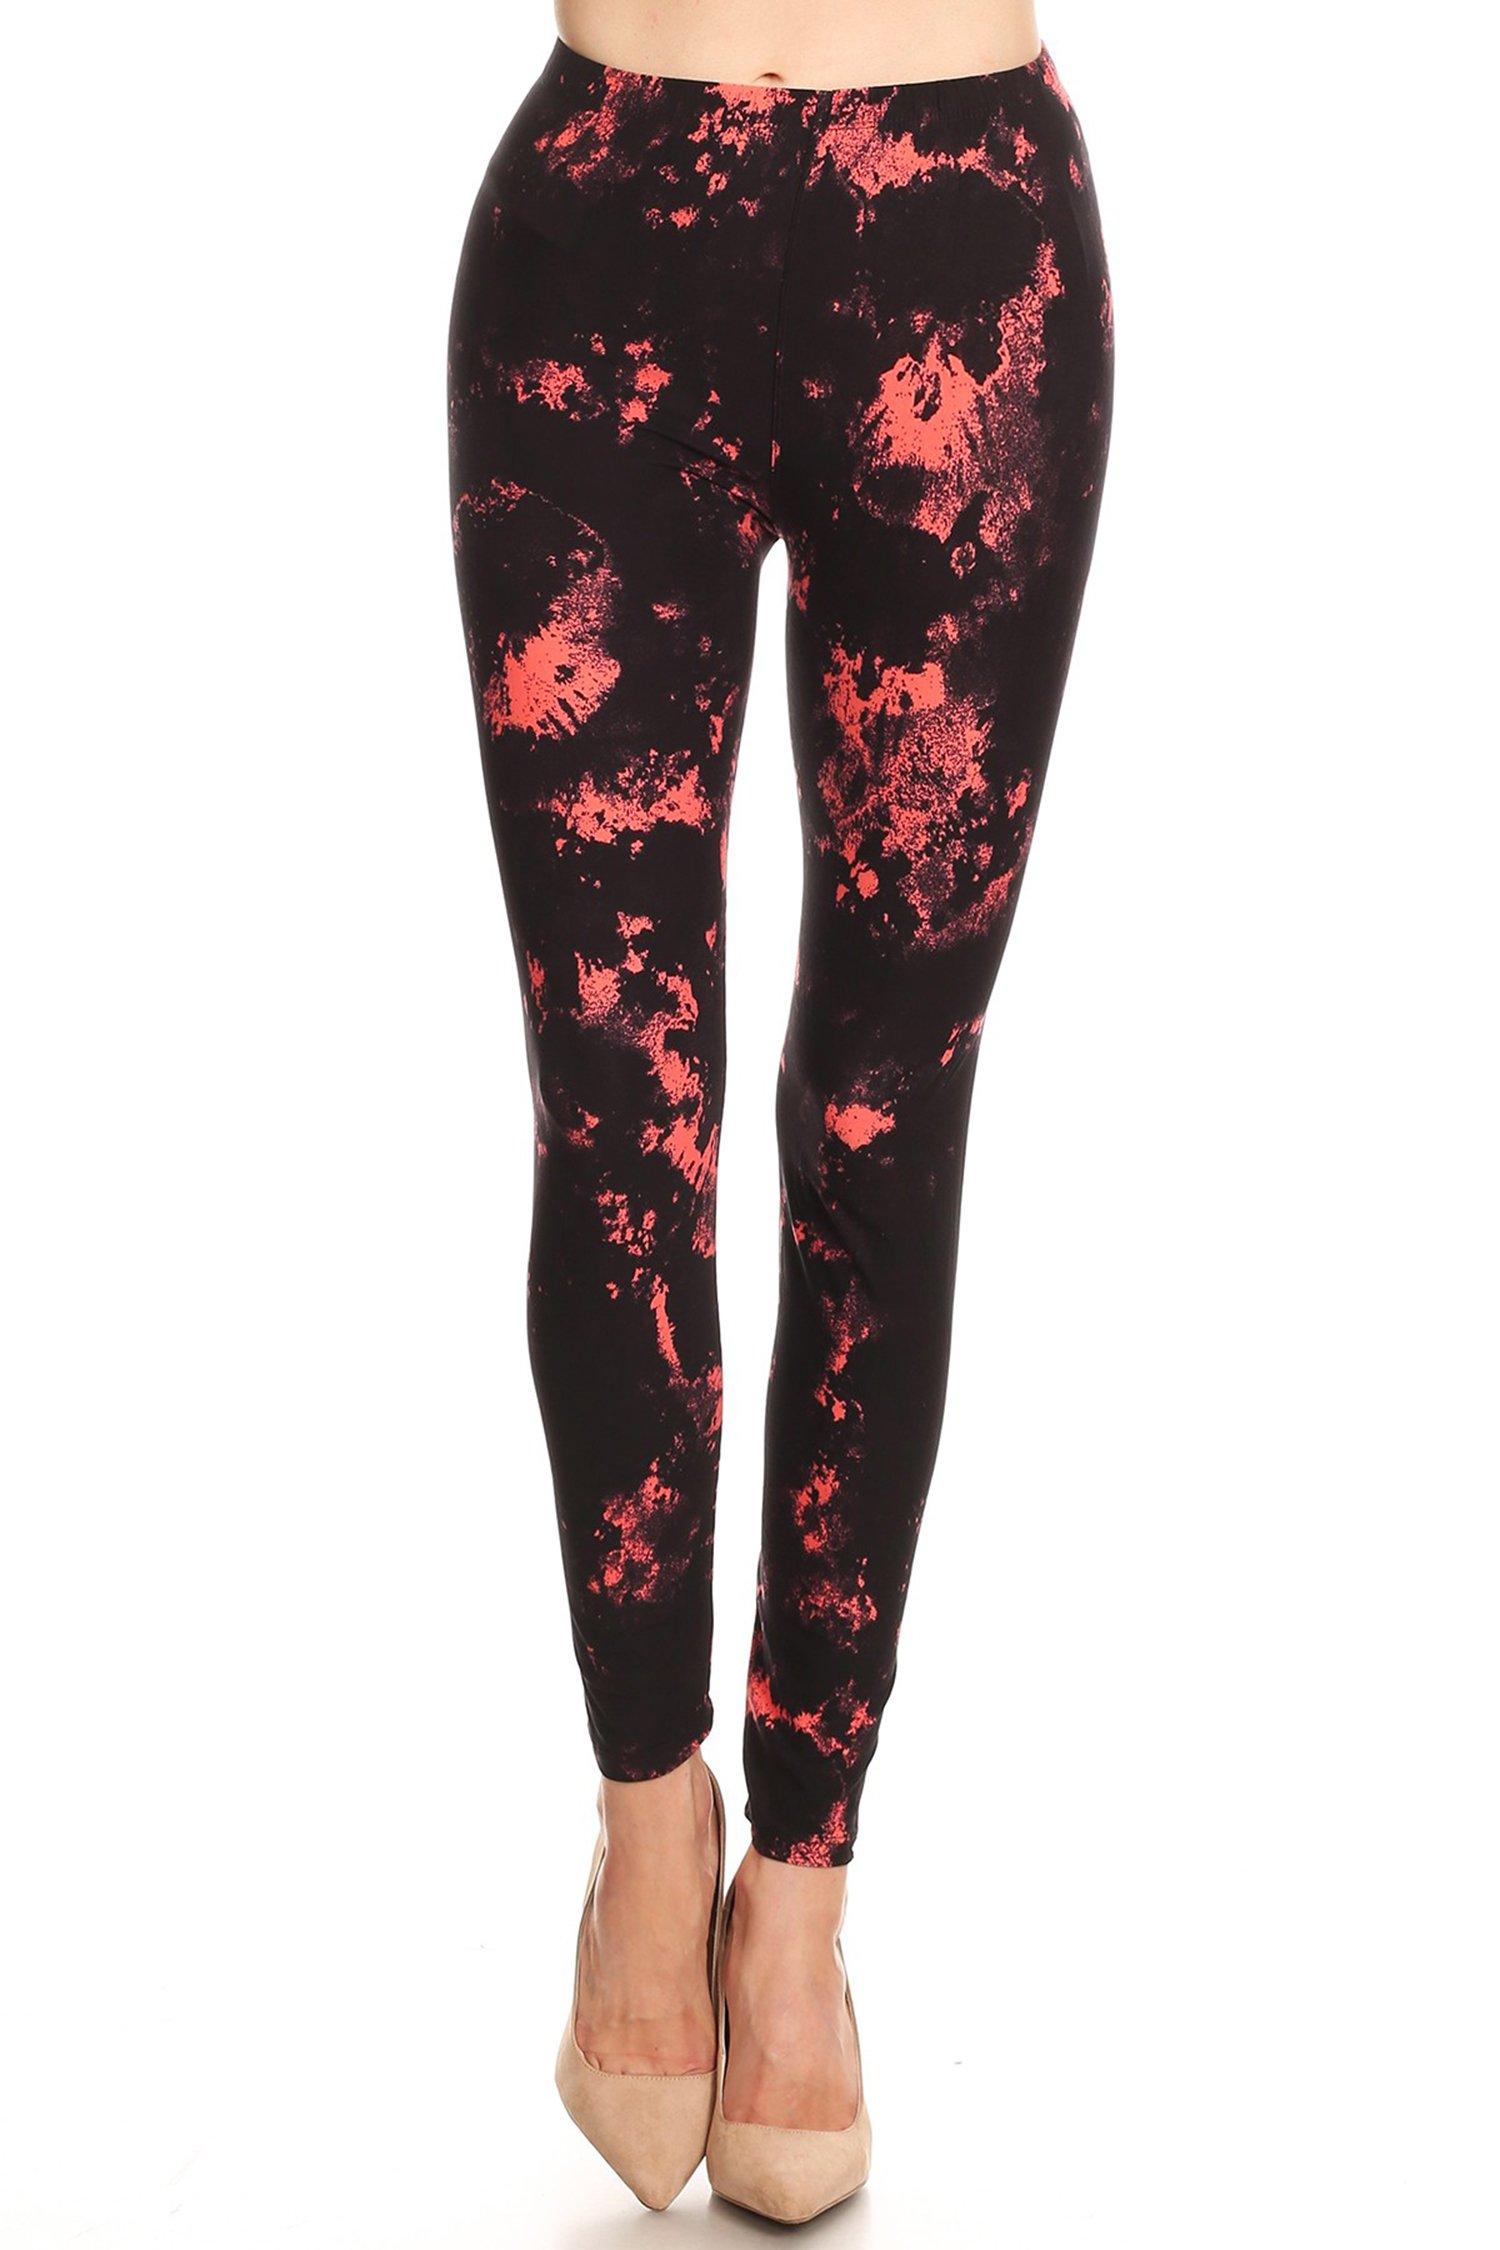 Leggings Mania Women's Tie Dye Print High Waist Soft Leggings Plus Coral Black